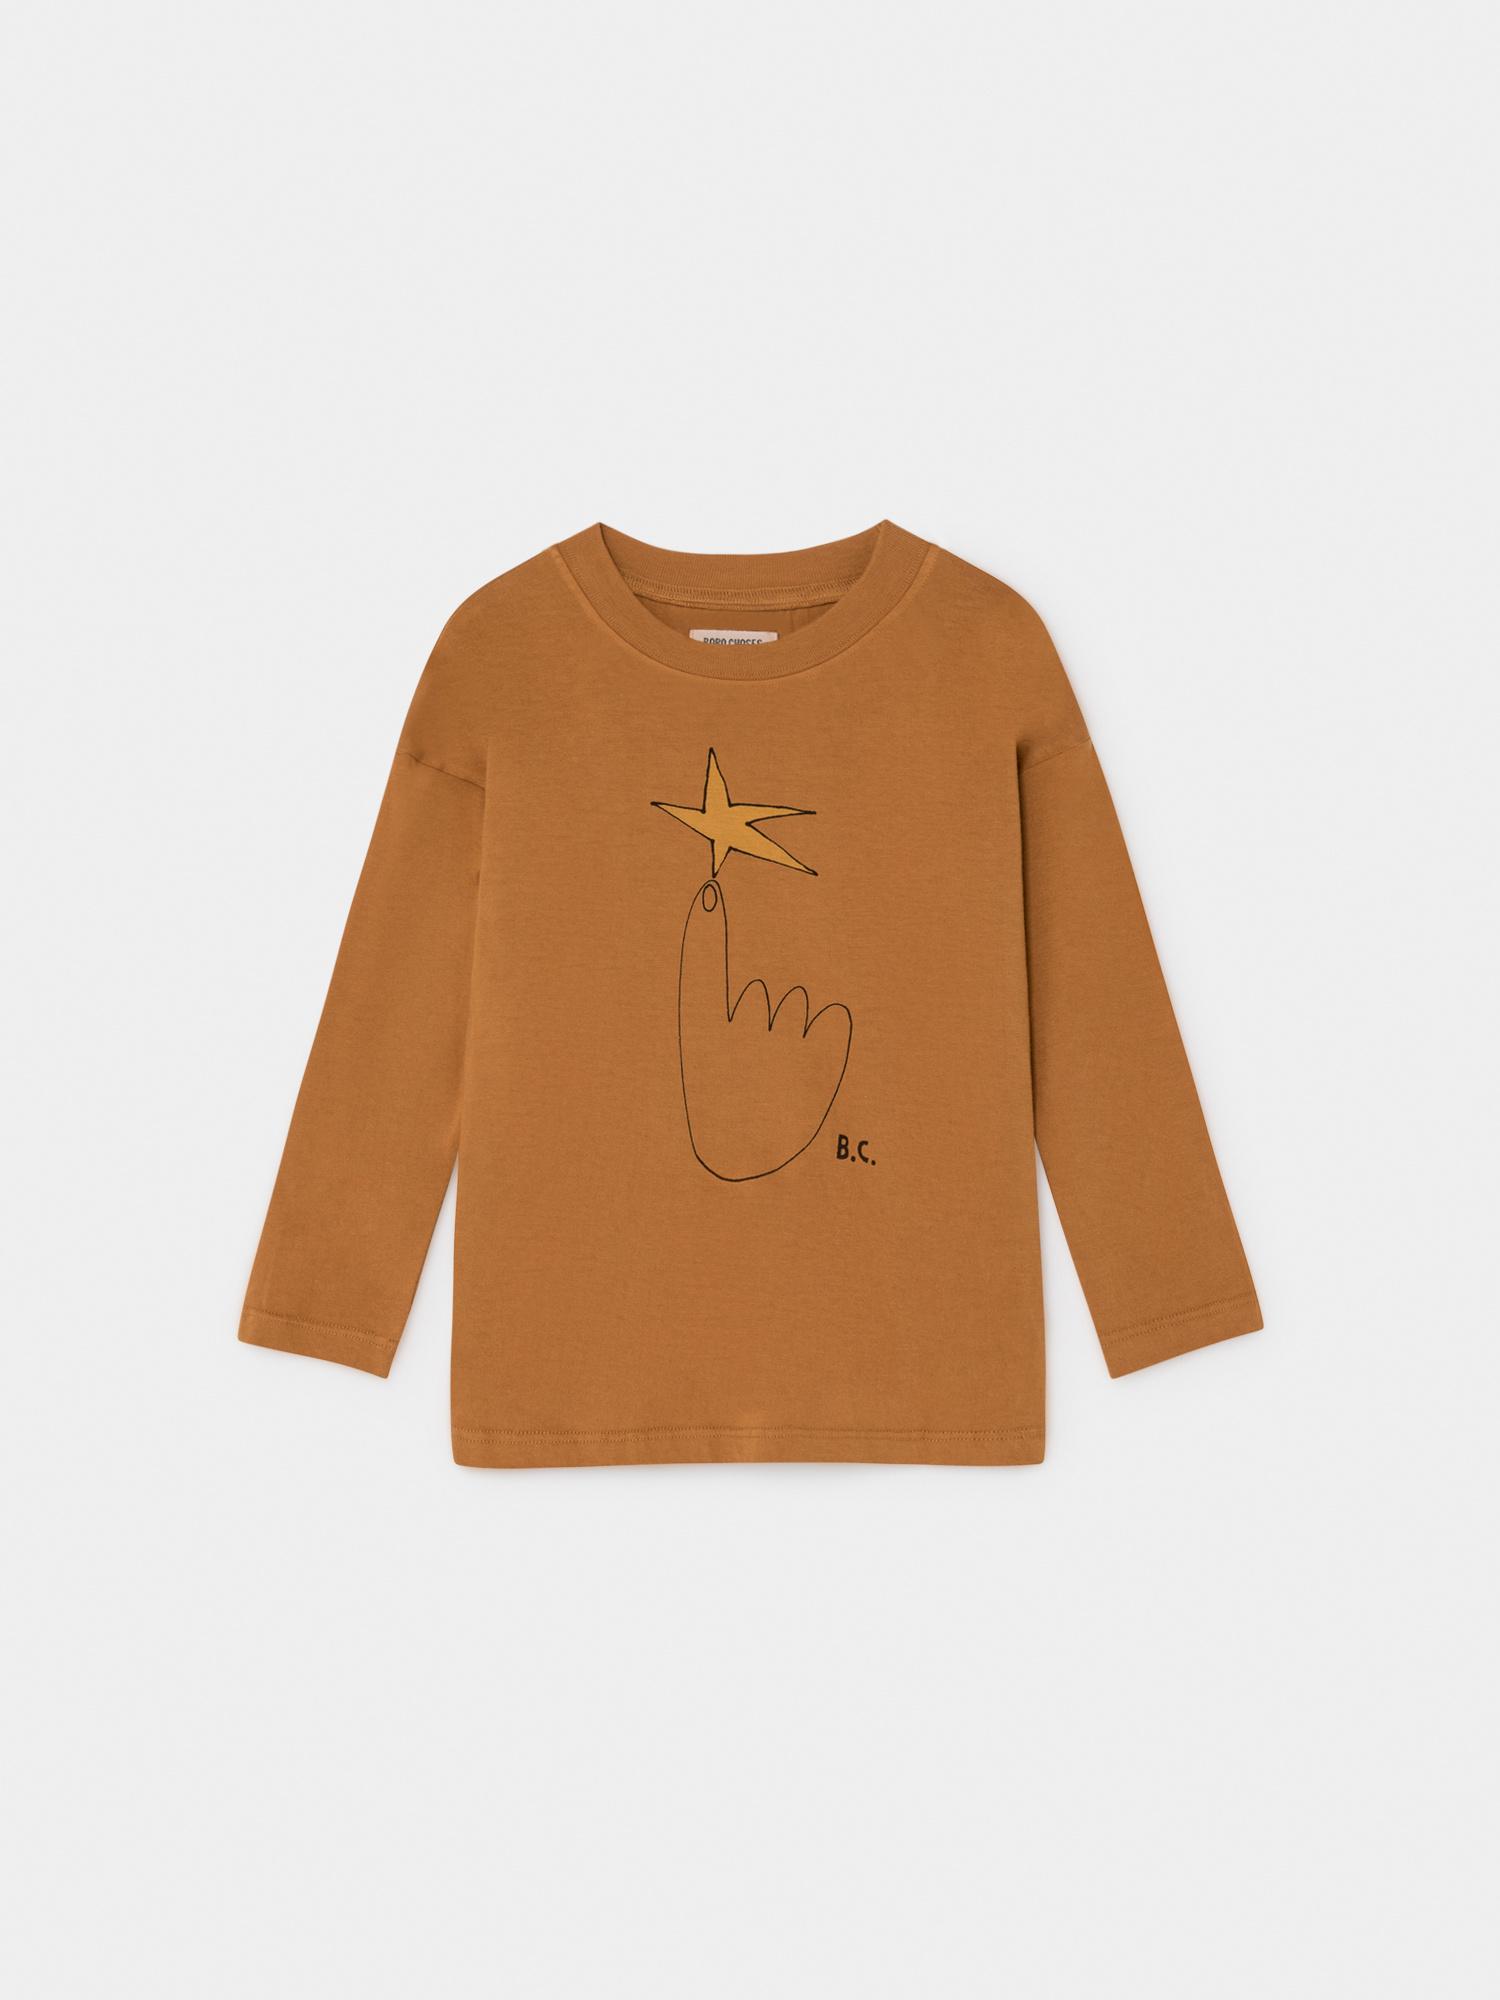 The Northstar Long Sleeve T-Shirt-1